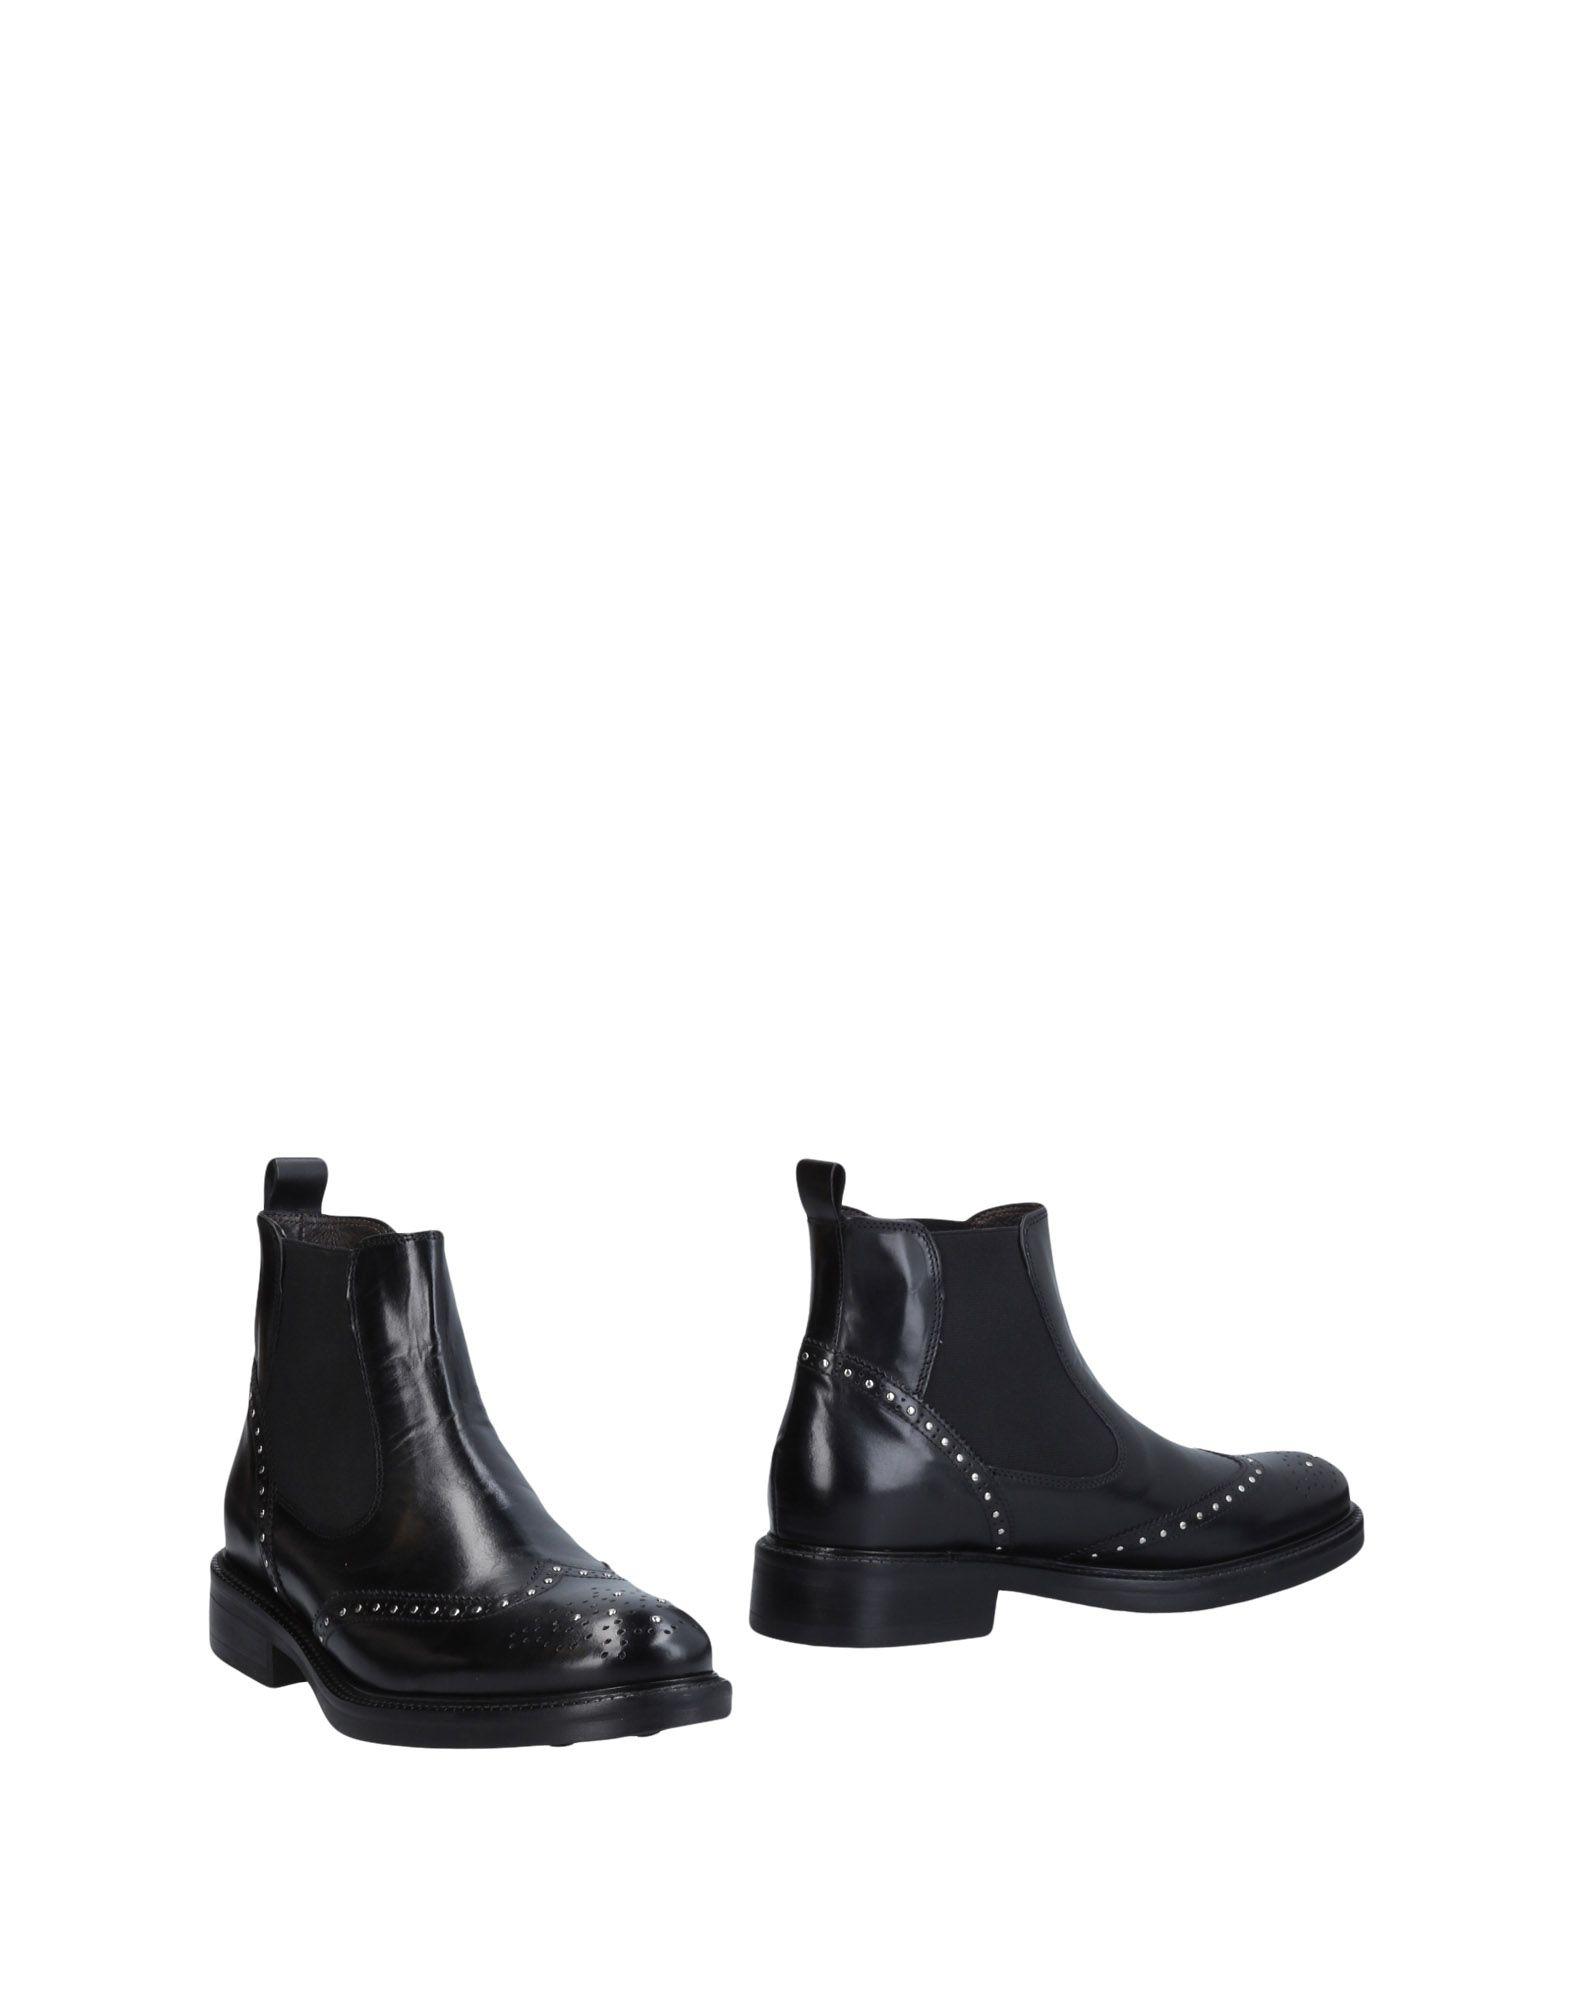 MFW COLLECTION Полусапоги и высокие ботинки ботинки zenden collection zenden collection ze012abkoc01